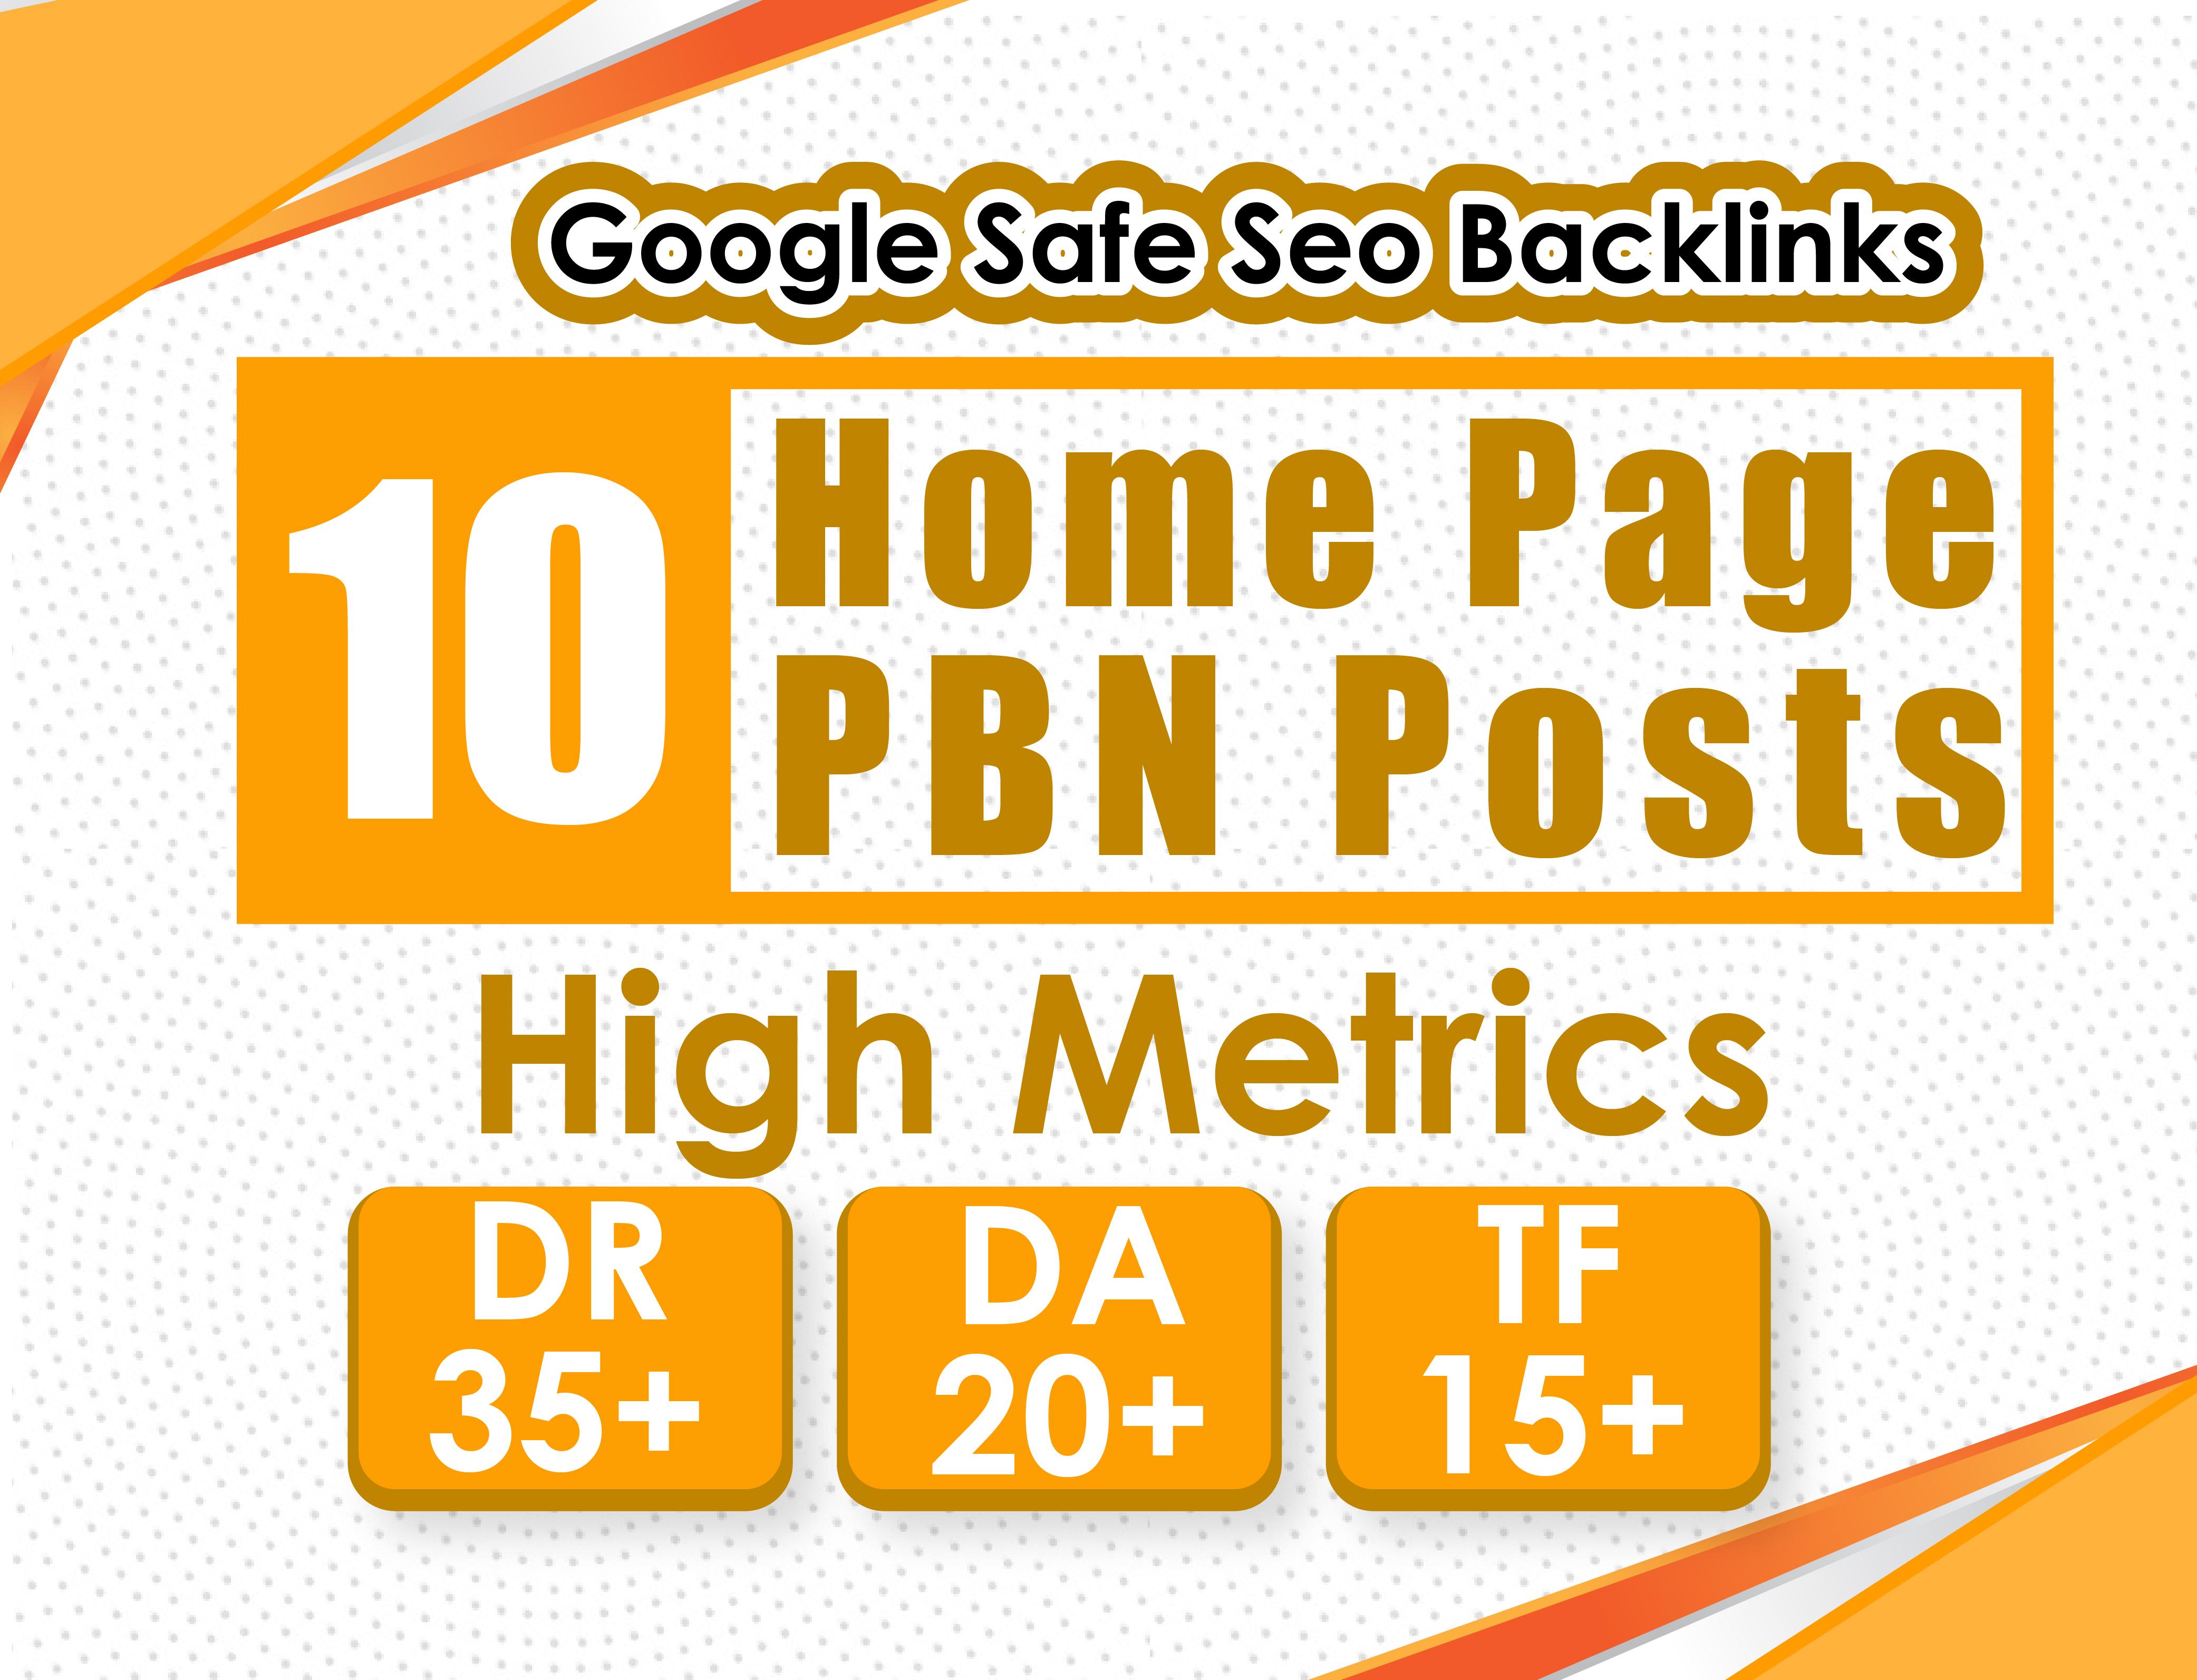 Build 10 HomePage Post DA 20 Plus PBNs